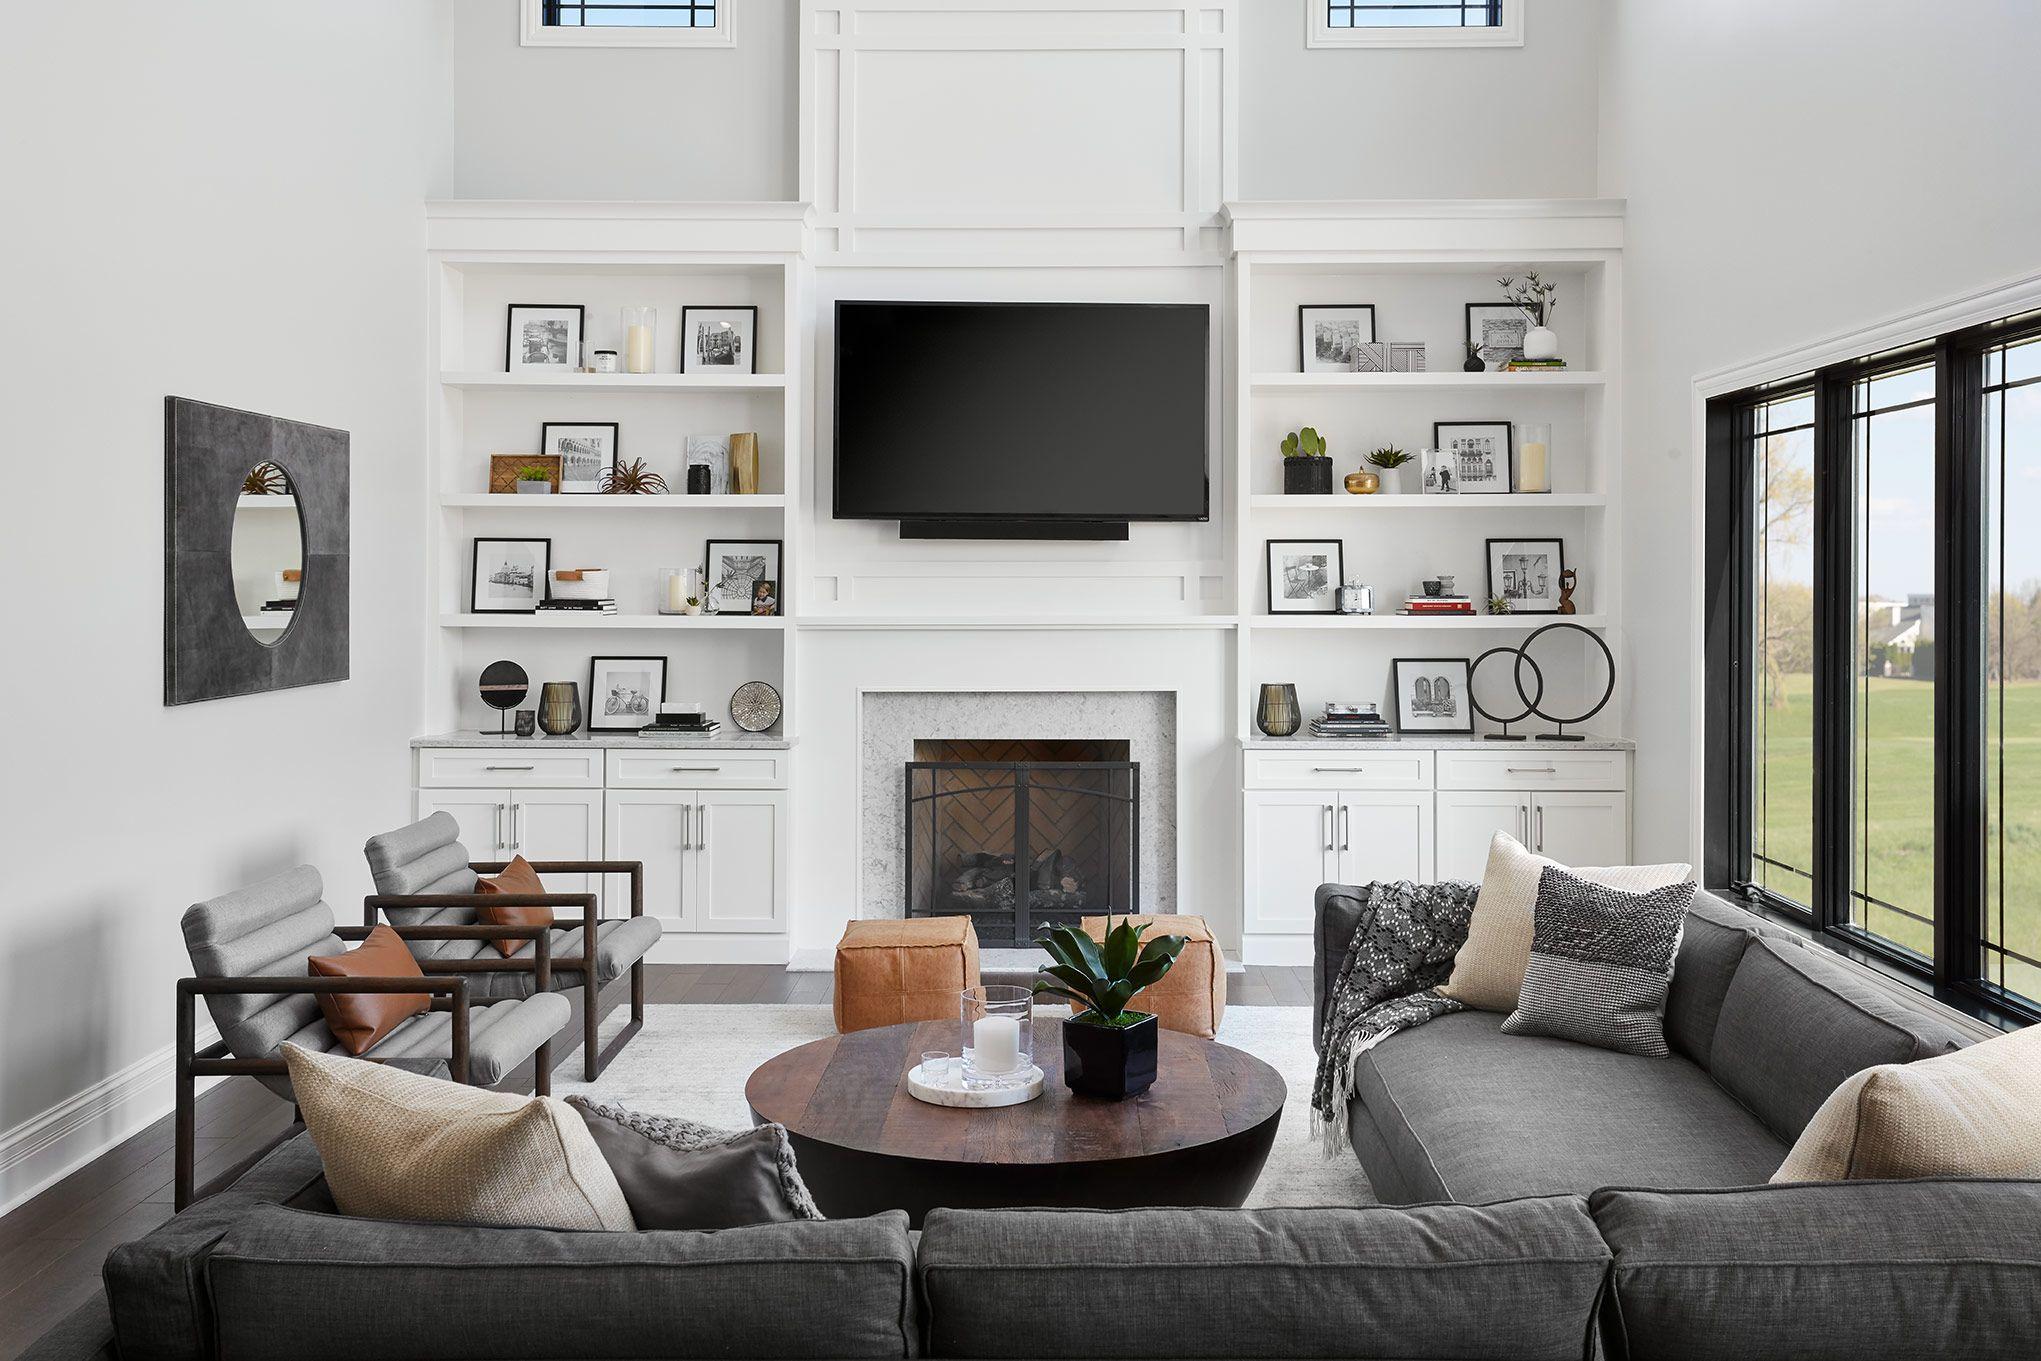 Modern Living Room in 2020 Luxe living room, Living room